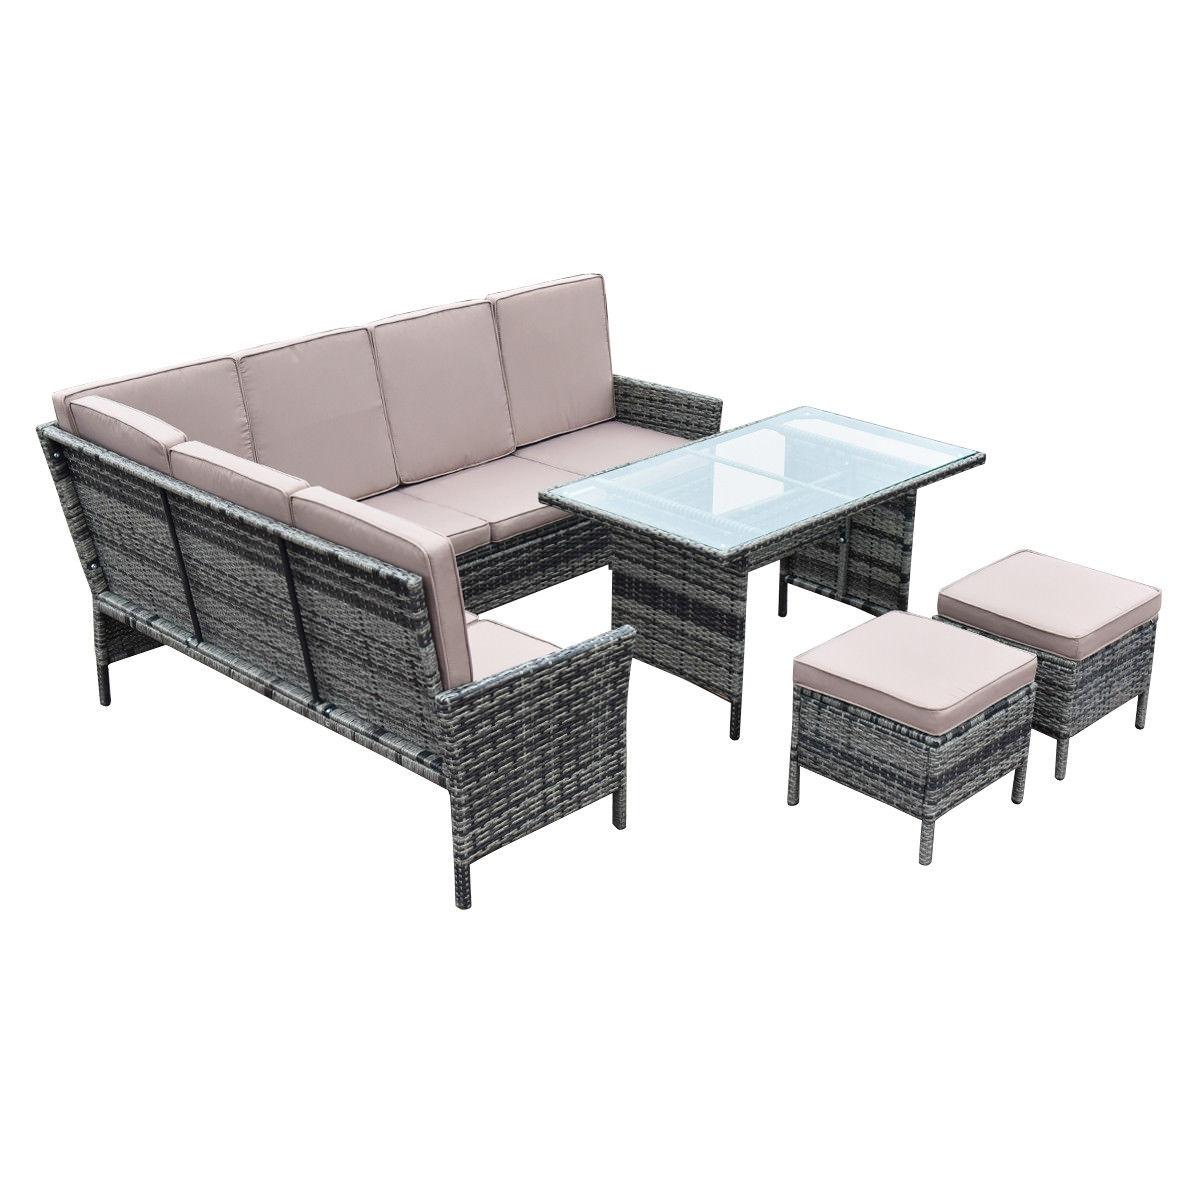 5 pcs Patio Wicker Rattan Furniture Set w/Brown Cushion